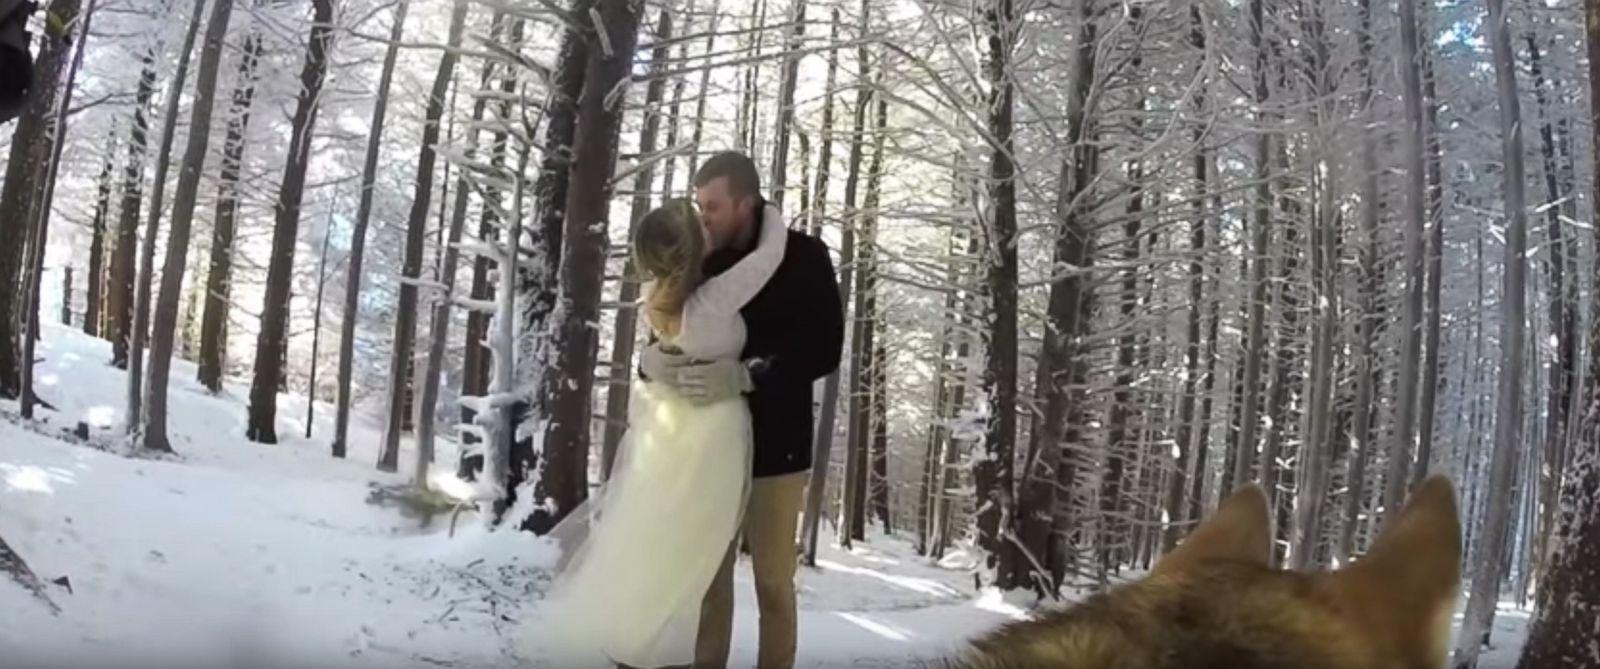 HT_go_pro_wedding_dog_ml_151124_31x13_1600